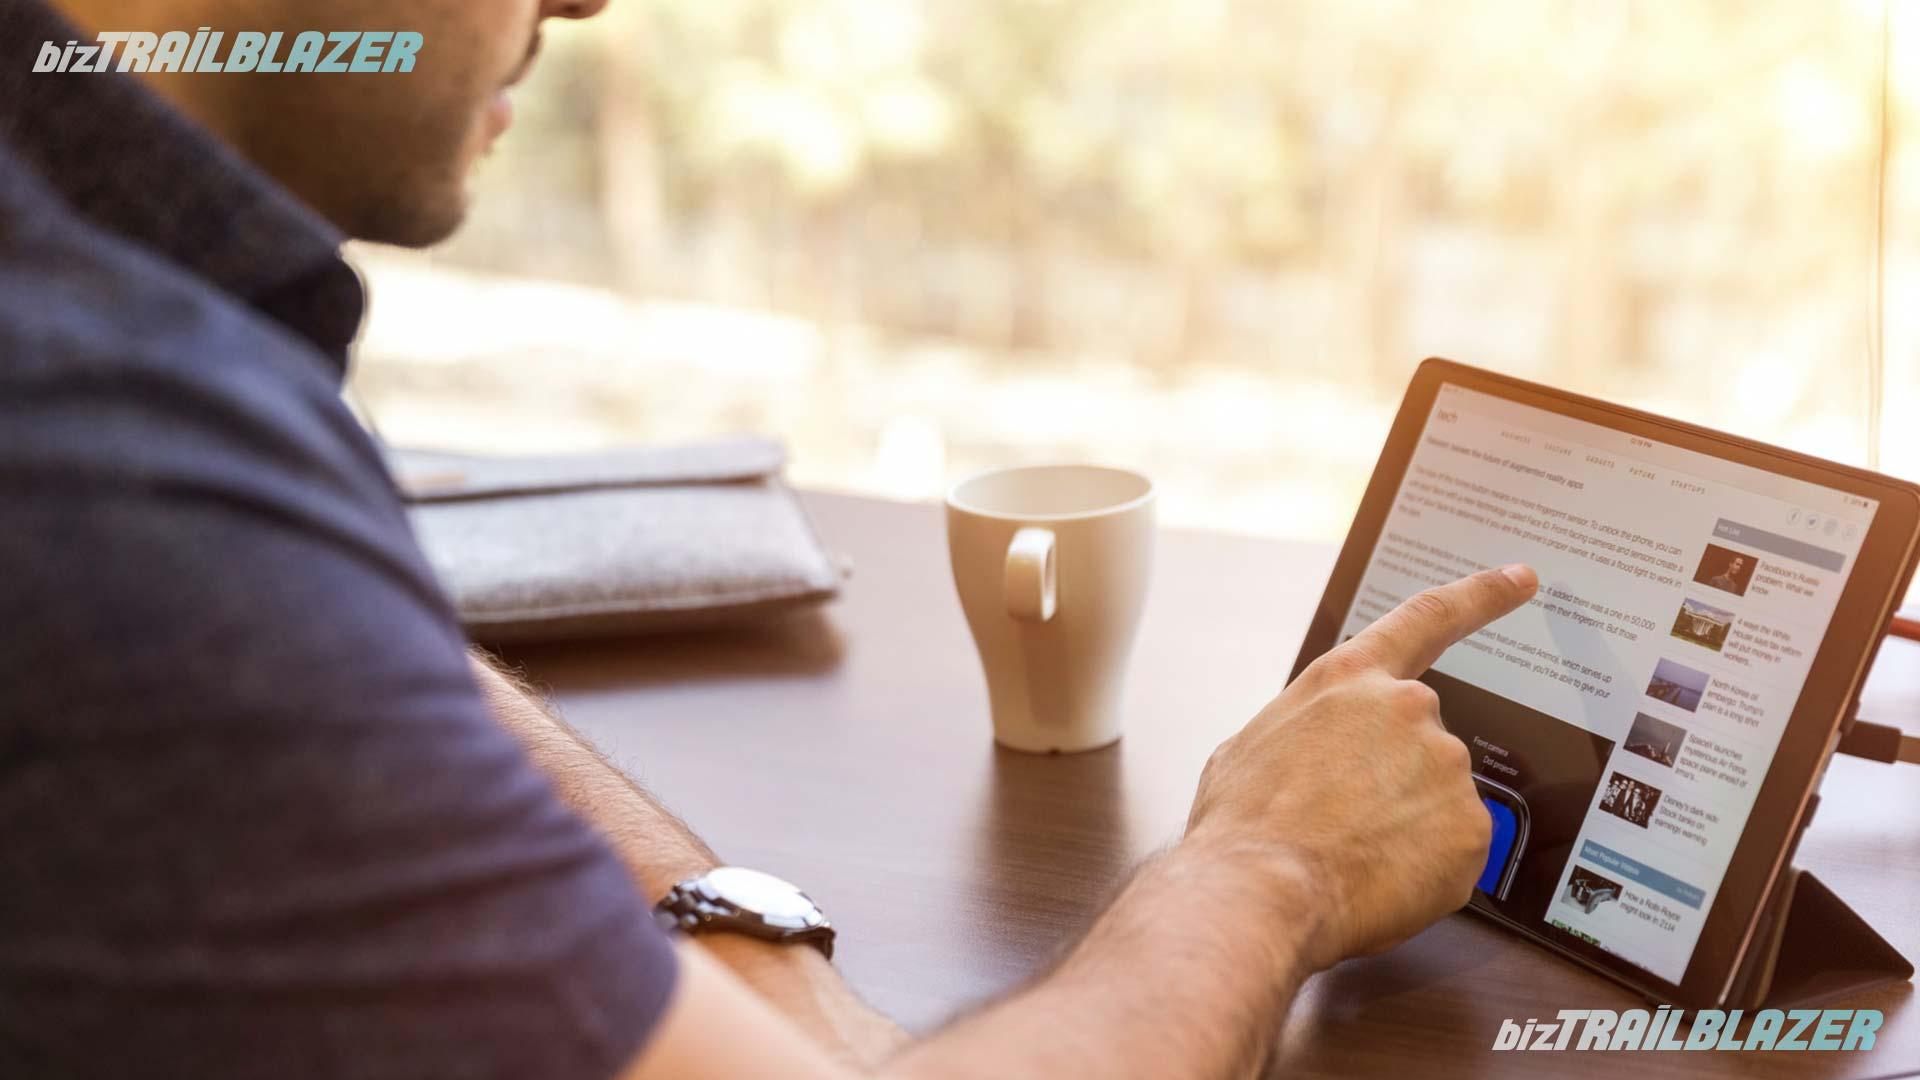 BizTrailBlazer-Blog-How-to-Stay-Safe-on-the-Internet-in-10-Ways